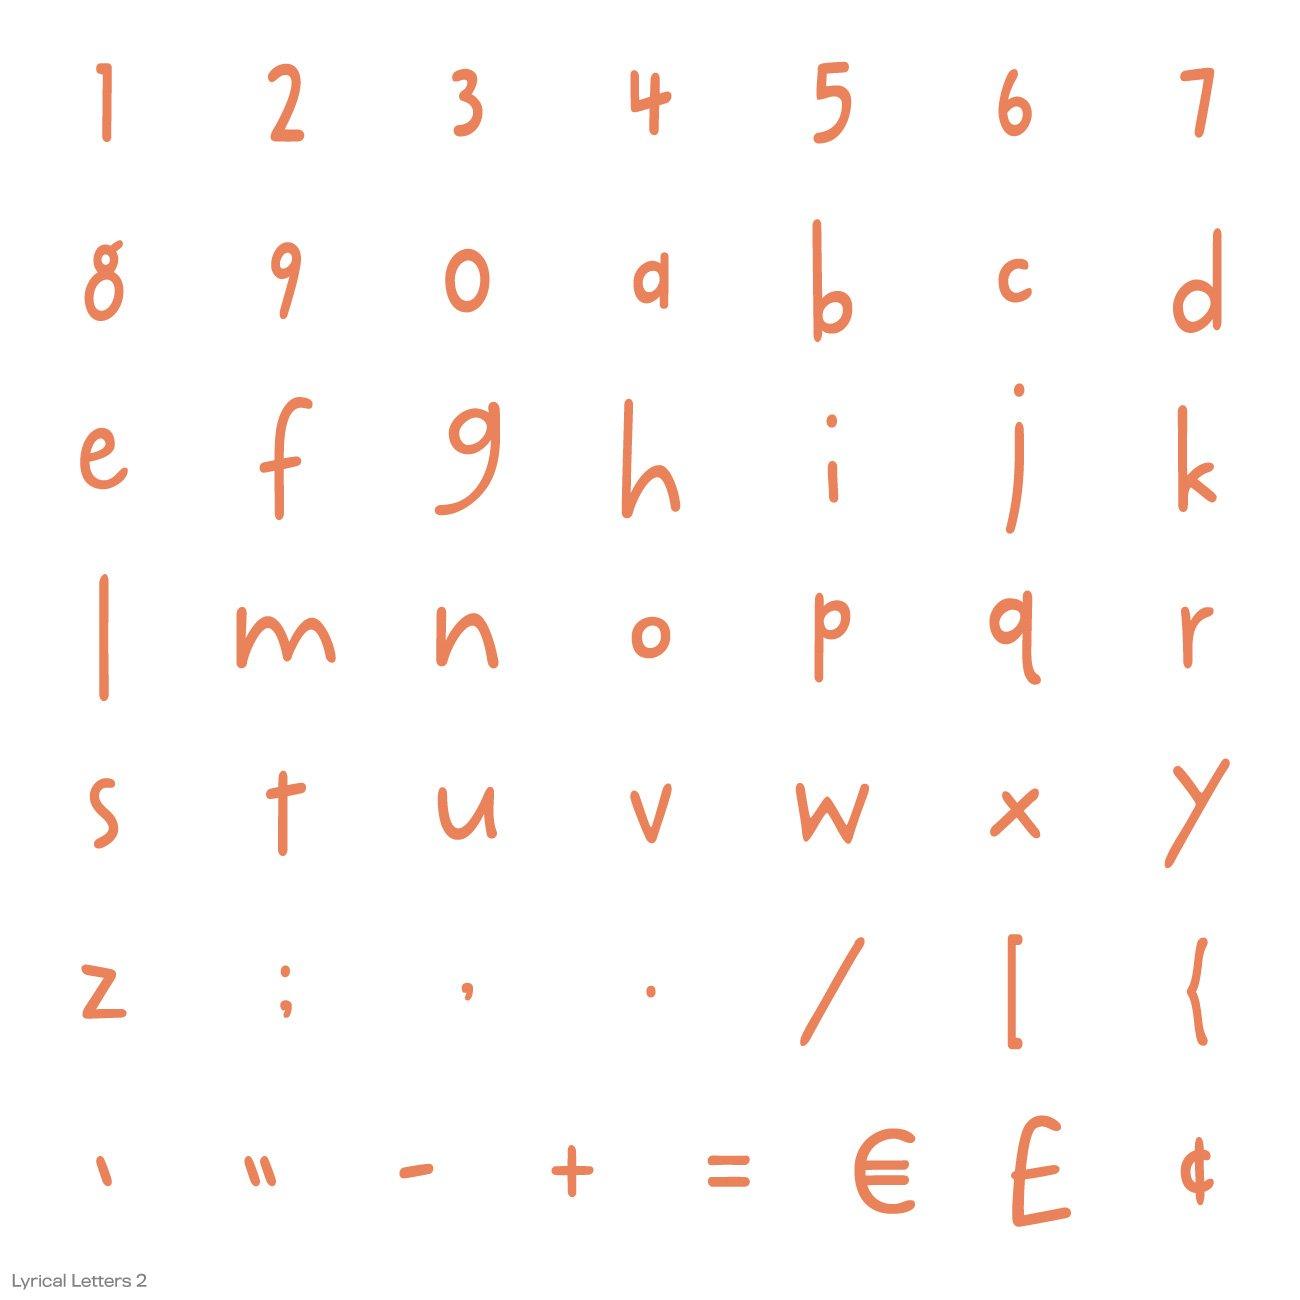 Cricut Lyrical Letters 2 Cartridge by Cricut (Image #12)